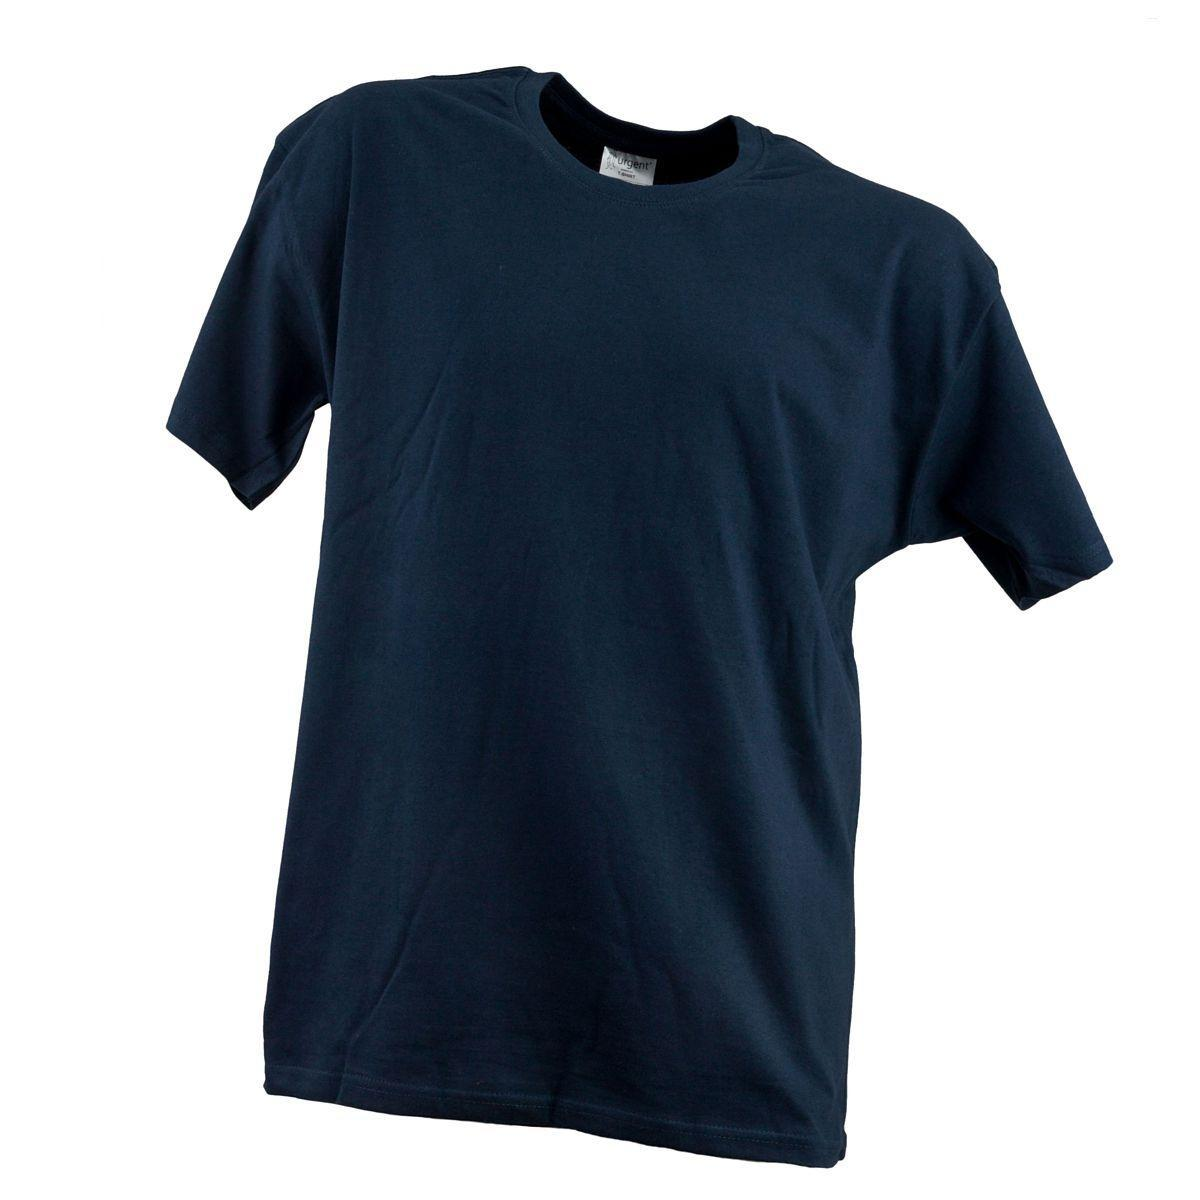 Футболка T-SHIRT MĘSKI GRANAT 180g плотностью 180g, темно-синего цвета.  Urgent (POLAND)